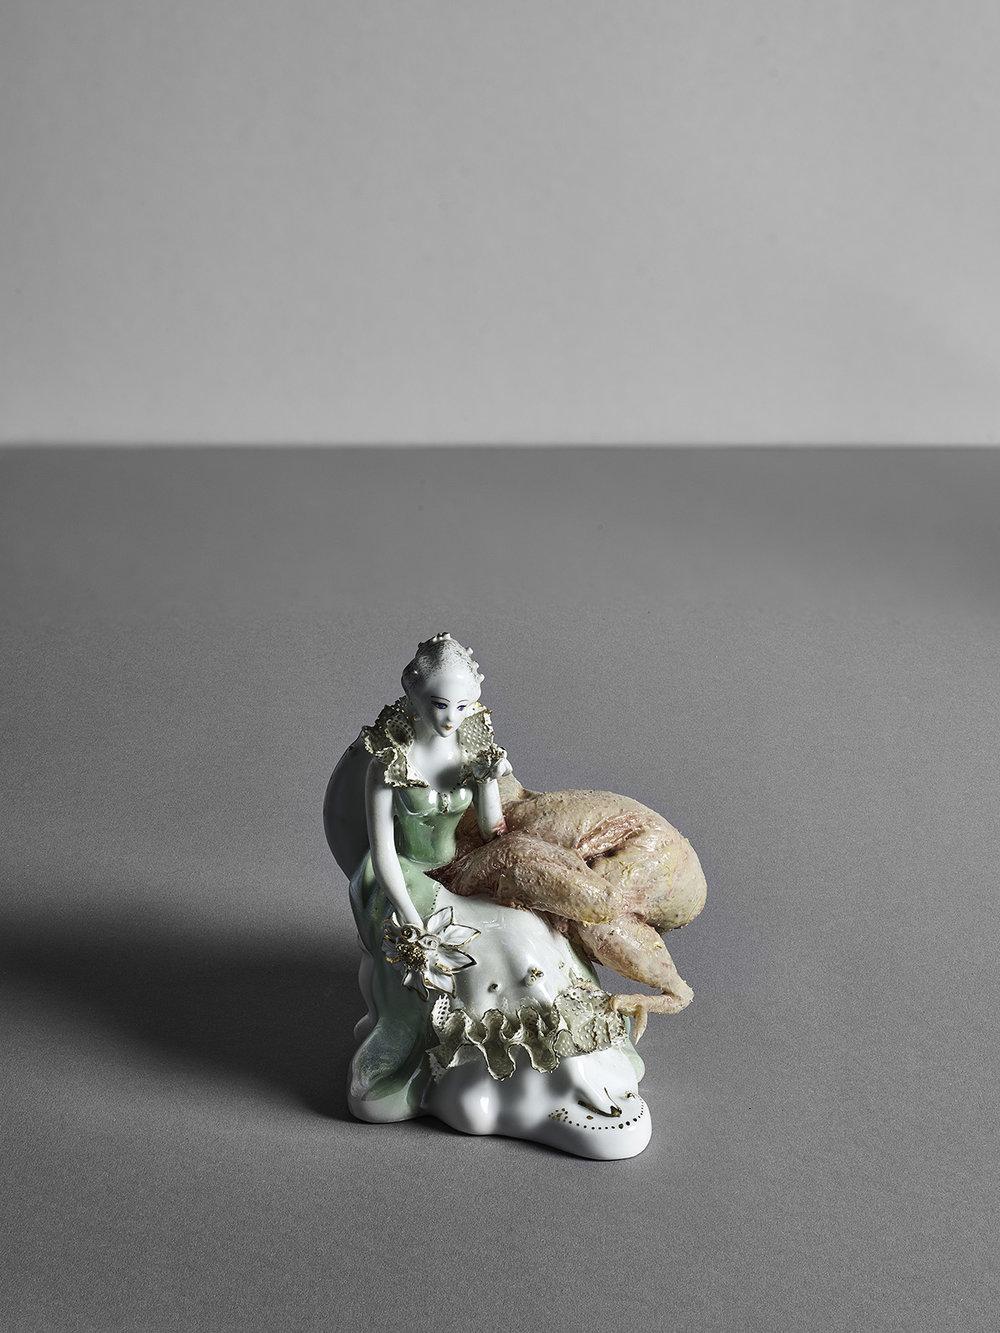 untitled (sittinglady), porcellain, silicone, silicone paint, 15 x 10 x 15 cm,2015